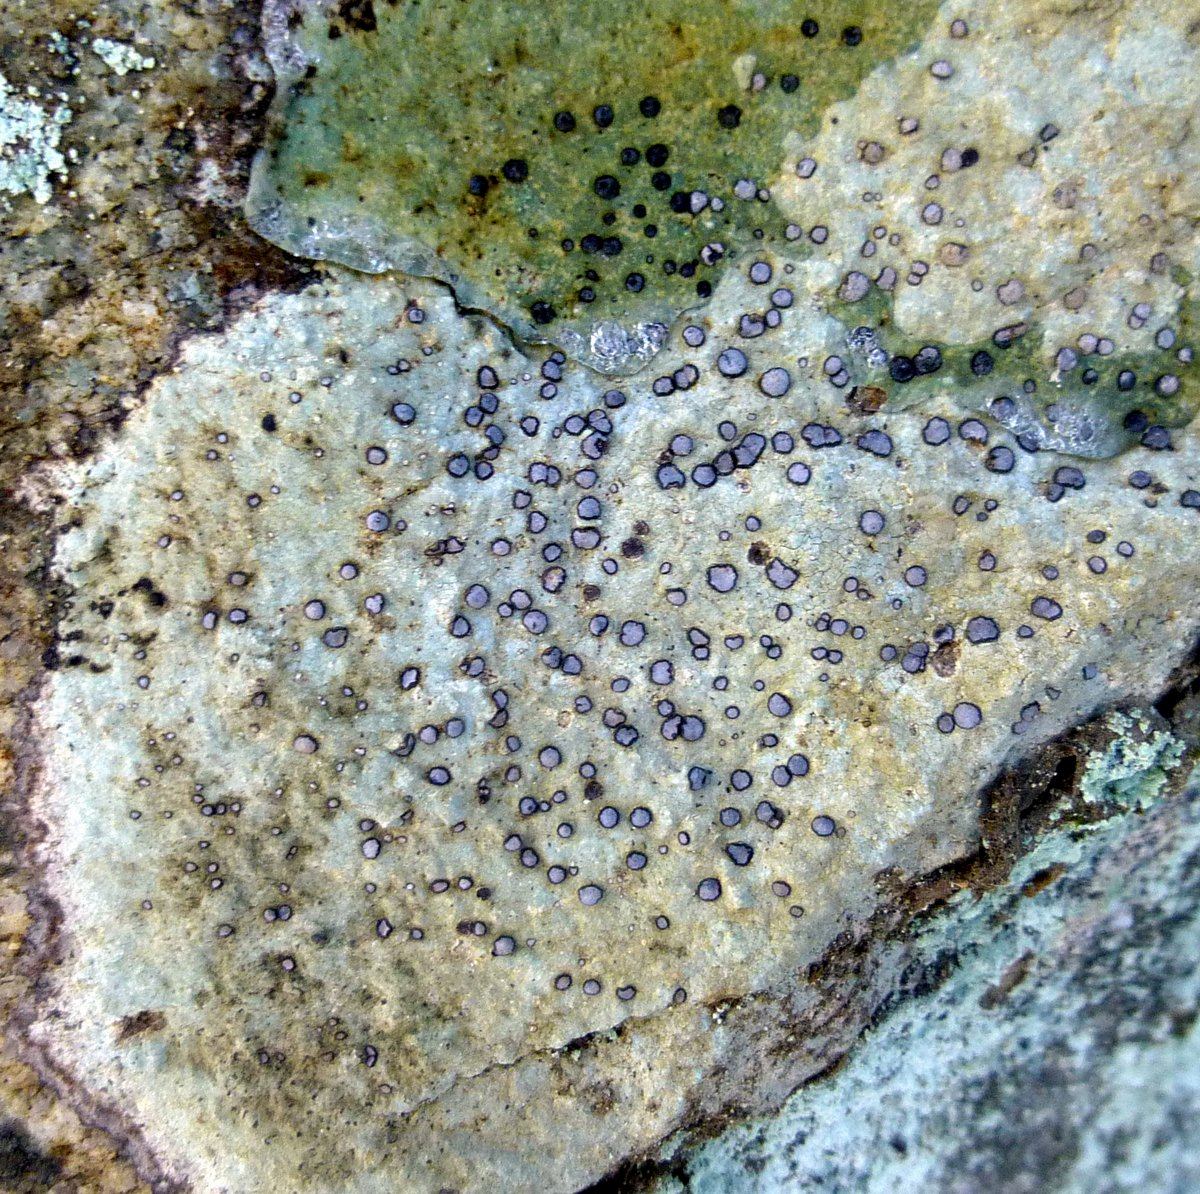 4. Smoky Eye Boulder Lichen